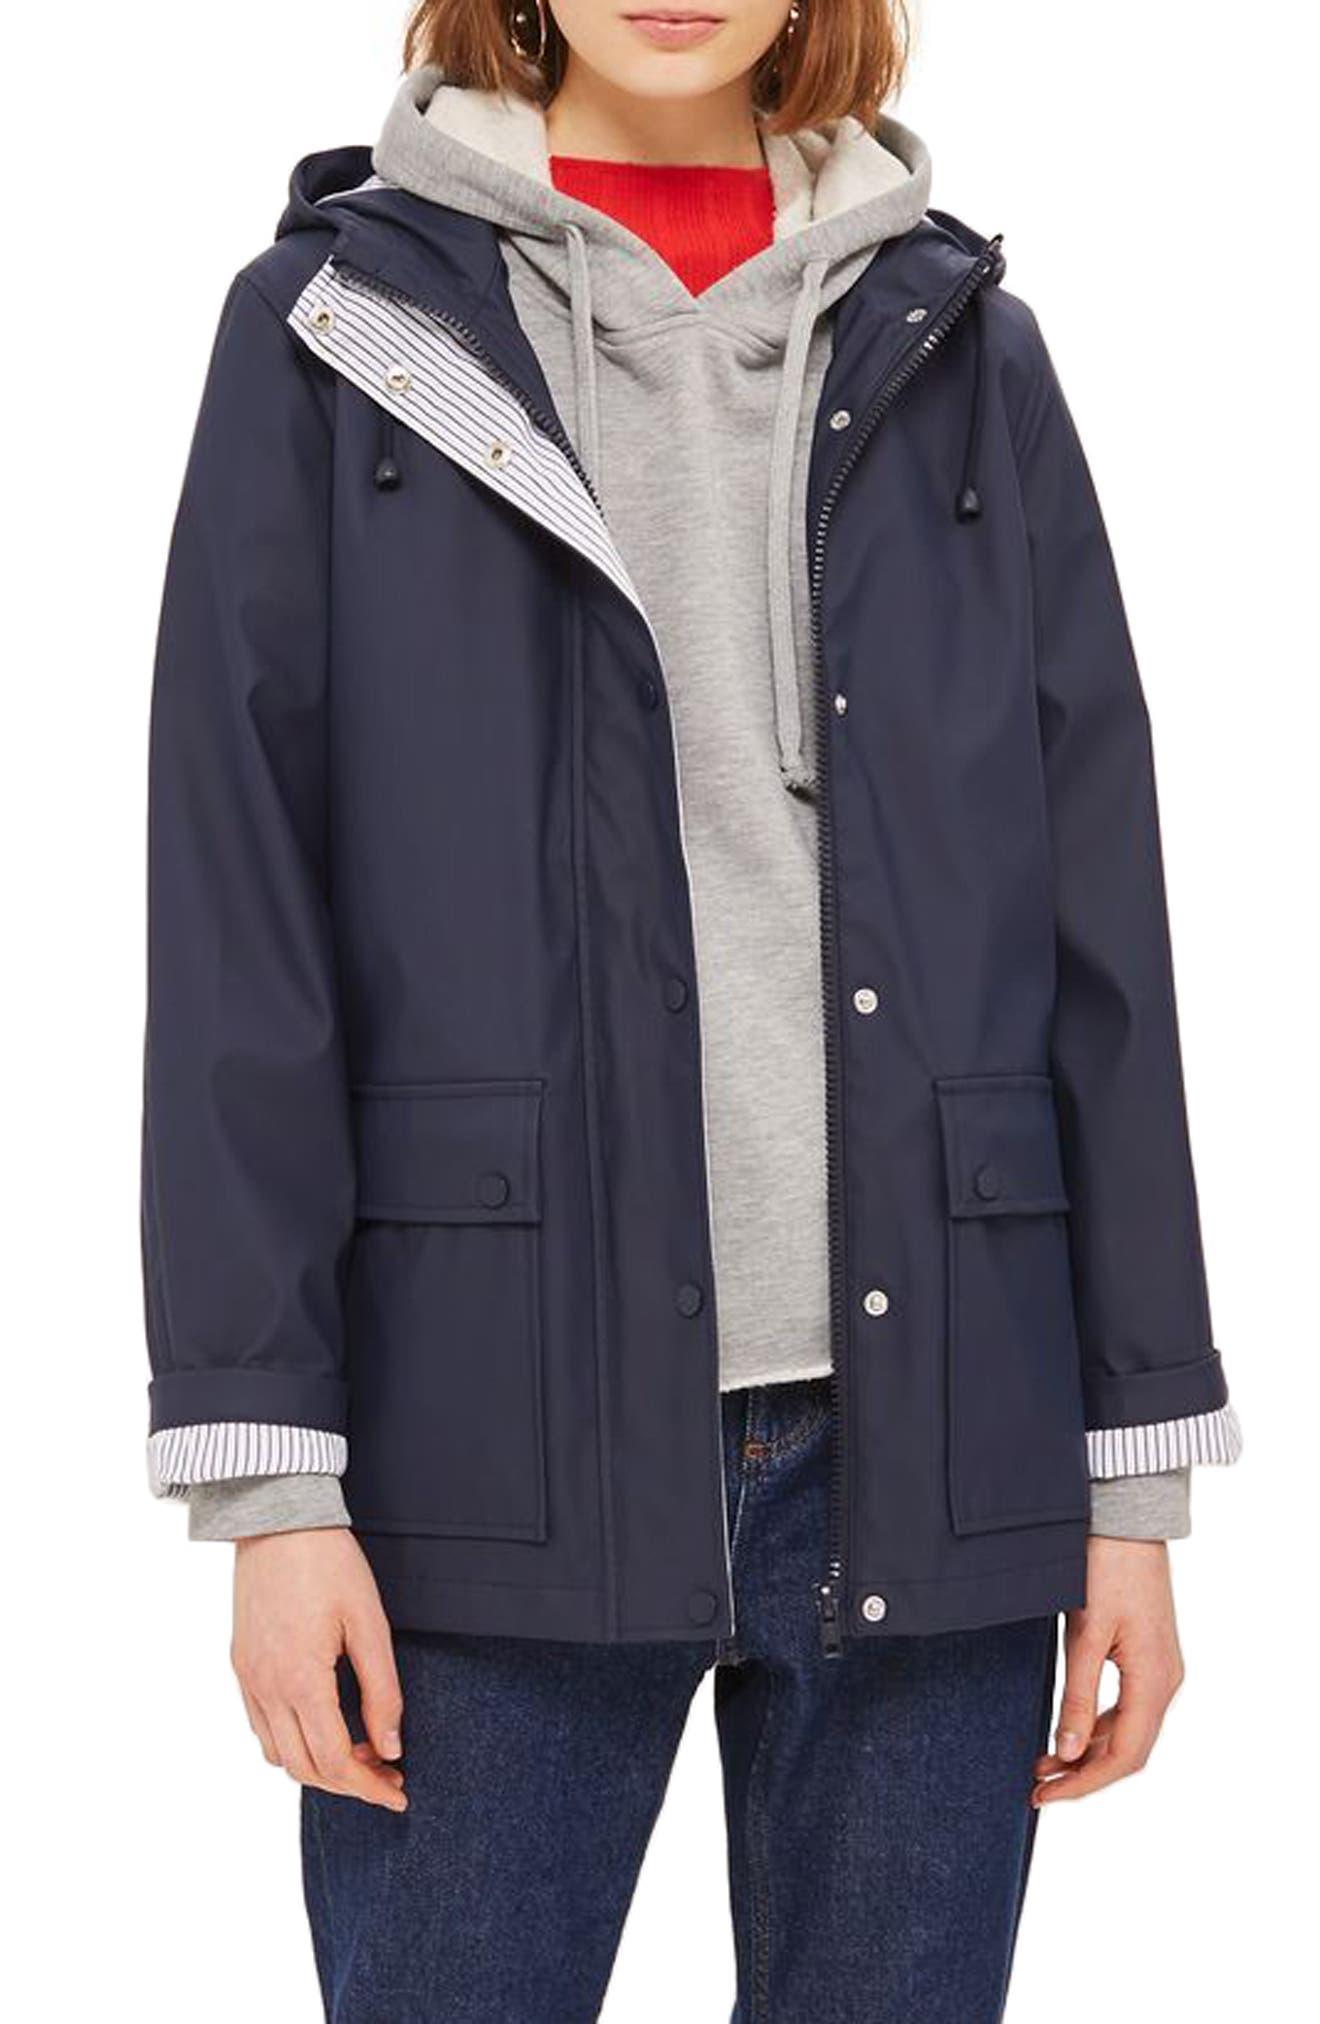 Maisie Rain Jacket,                             Main thumbnail 1, color,                             Navy Blue